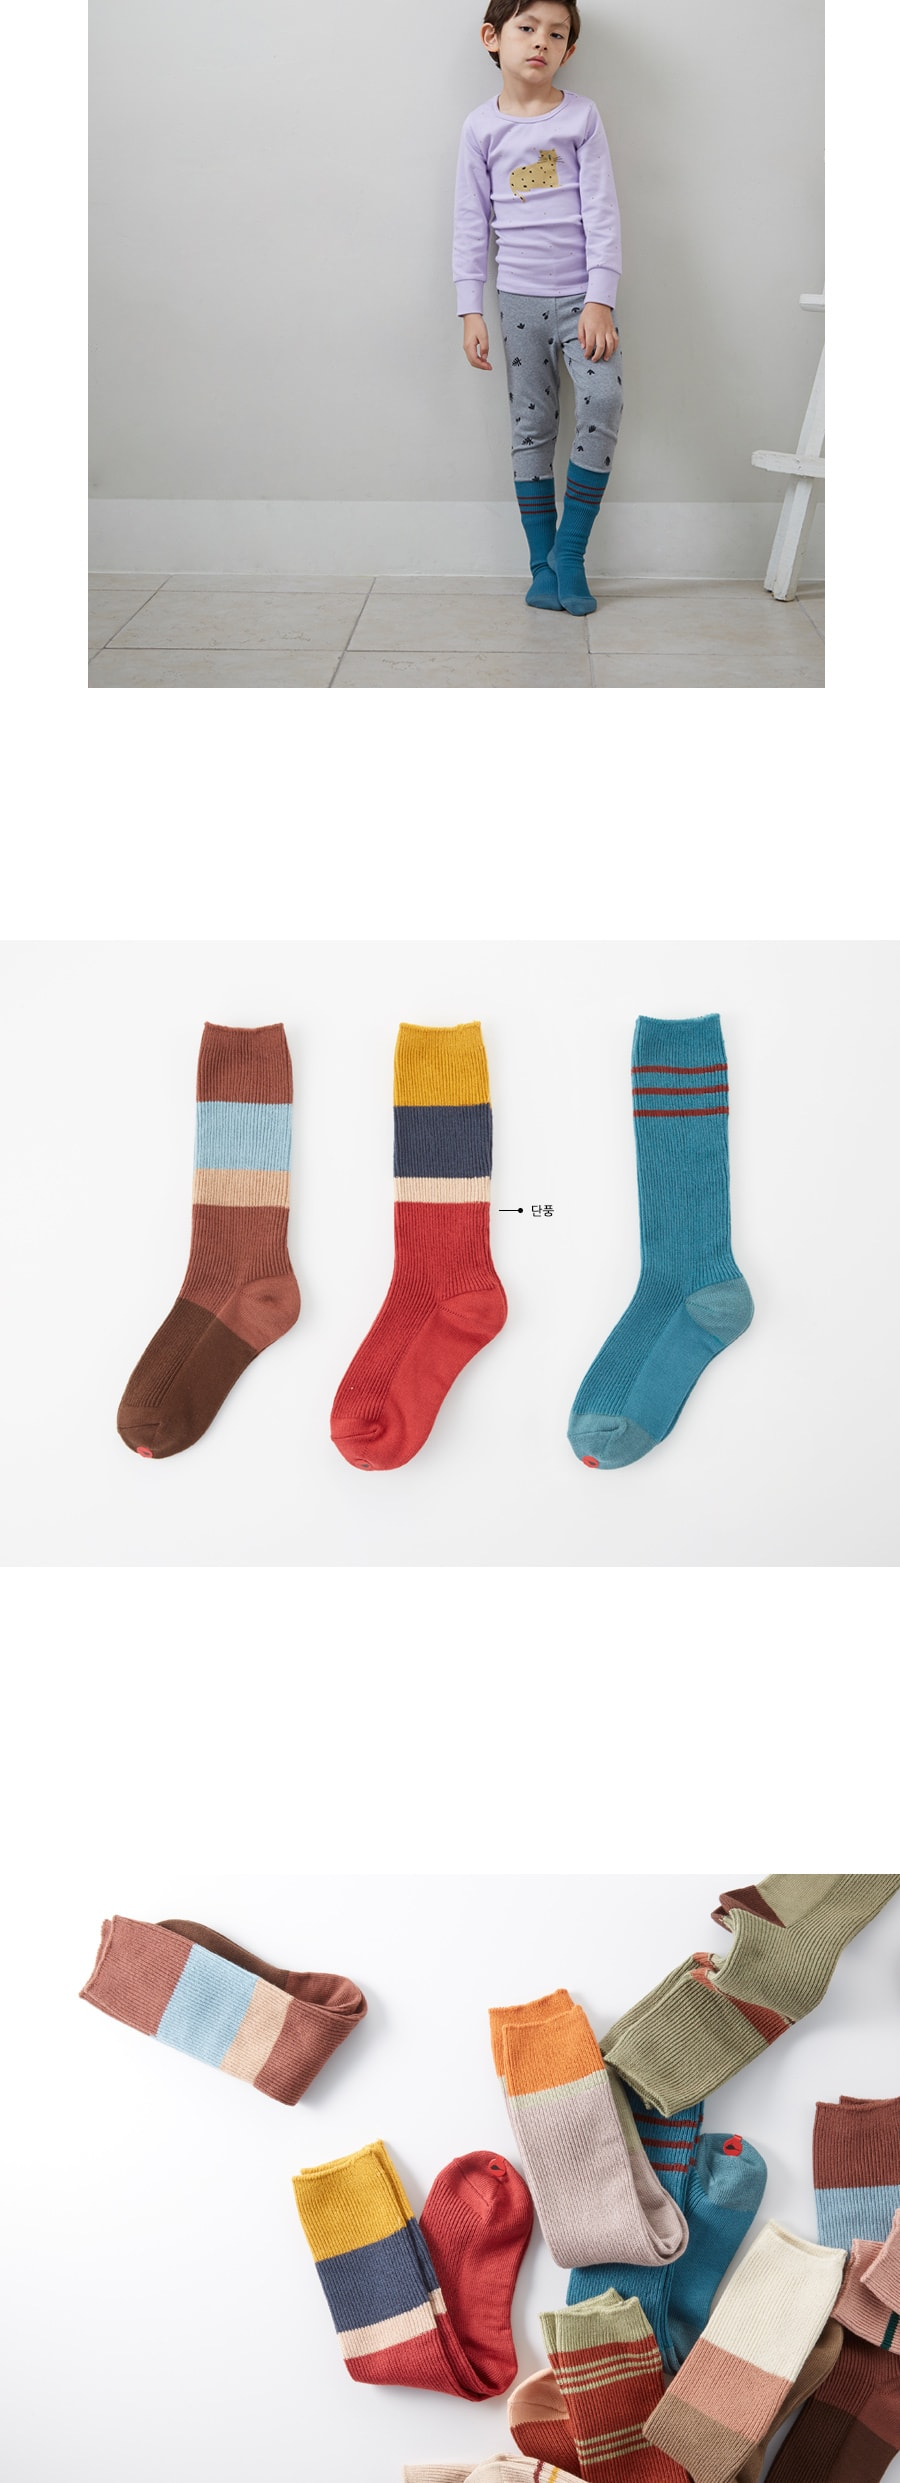 KOKACHARM - Korean Children Fashion - #Kfashion4kids - Tracking Socks - 3